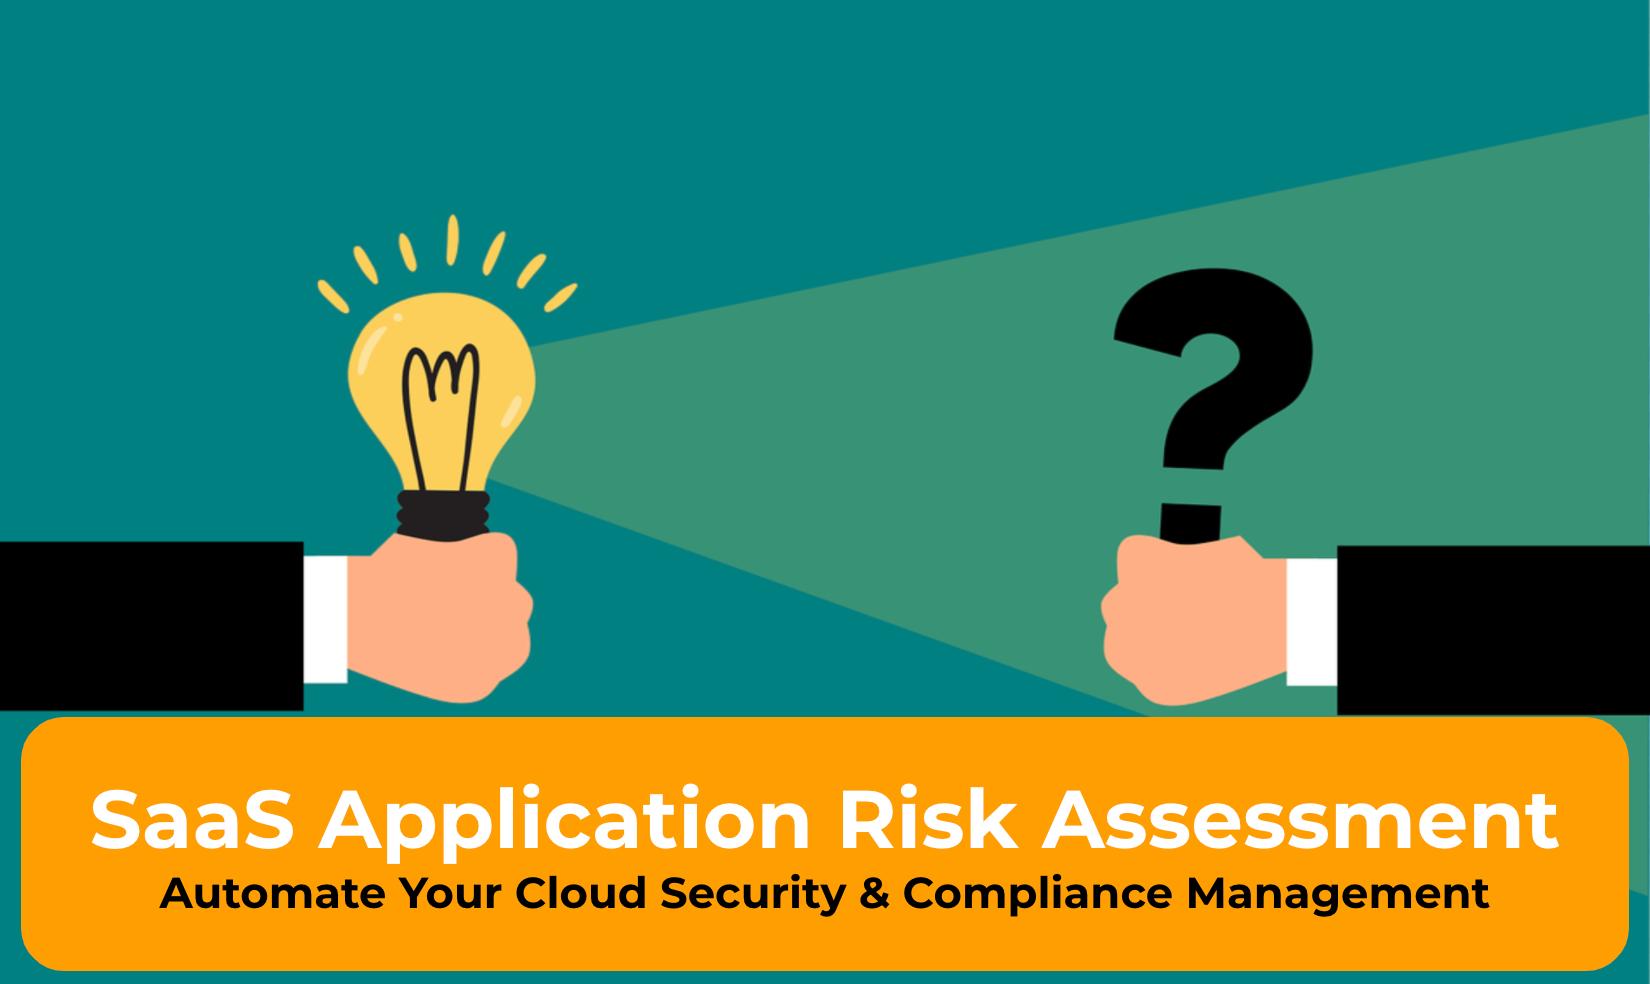 SaaS Application Risk Assessment Automate Your Cloud Security & Compliance Management